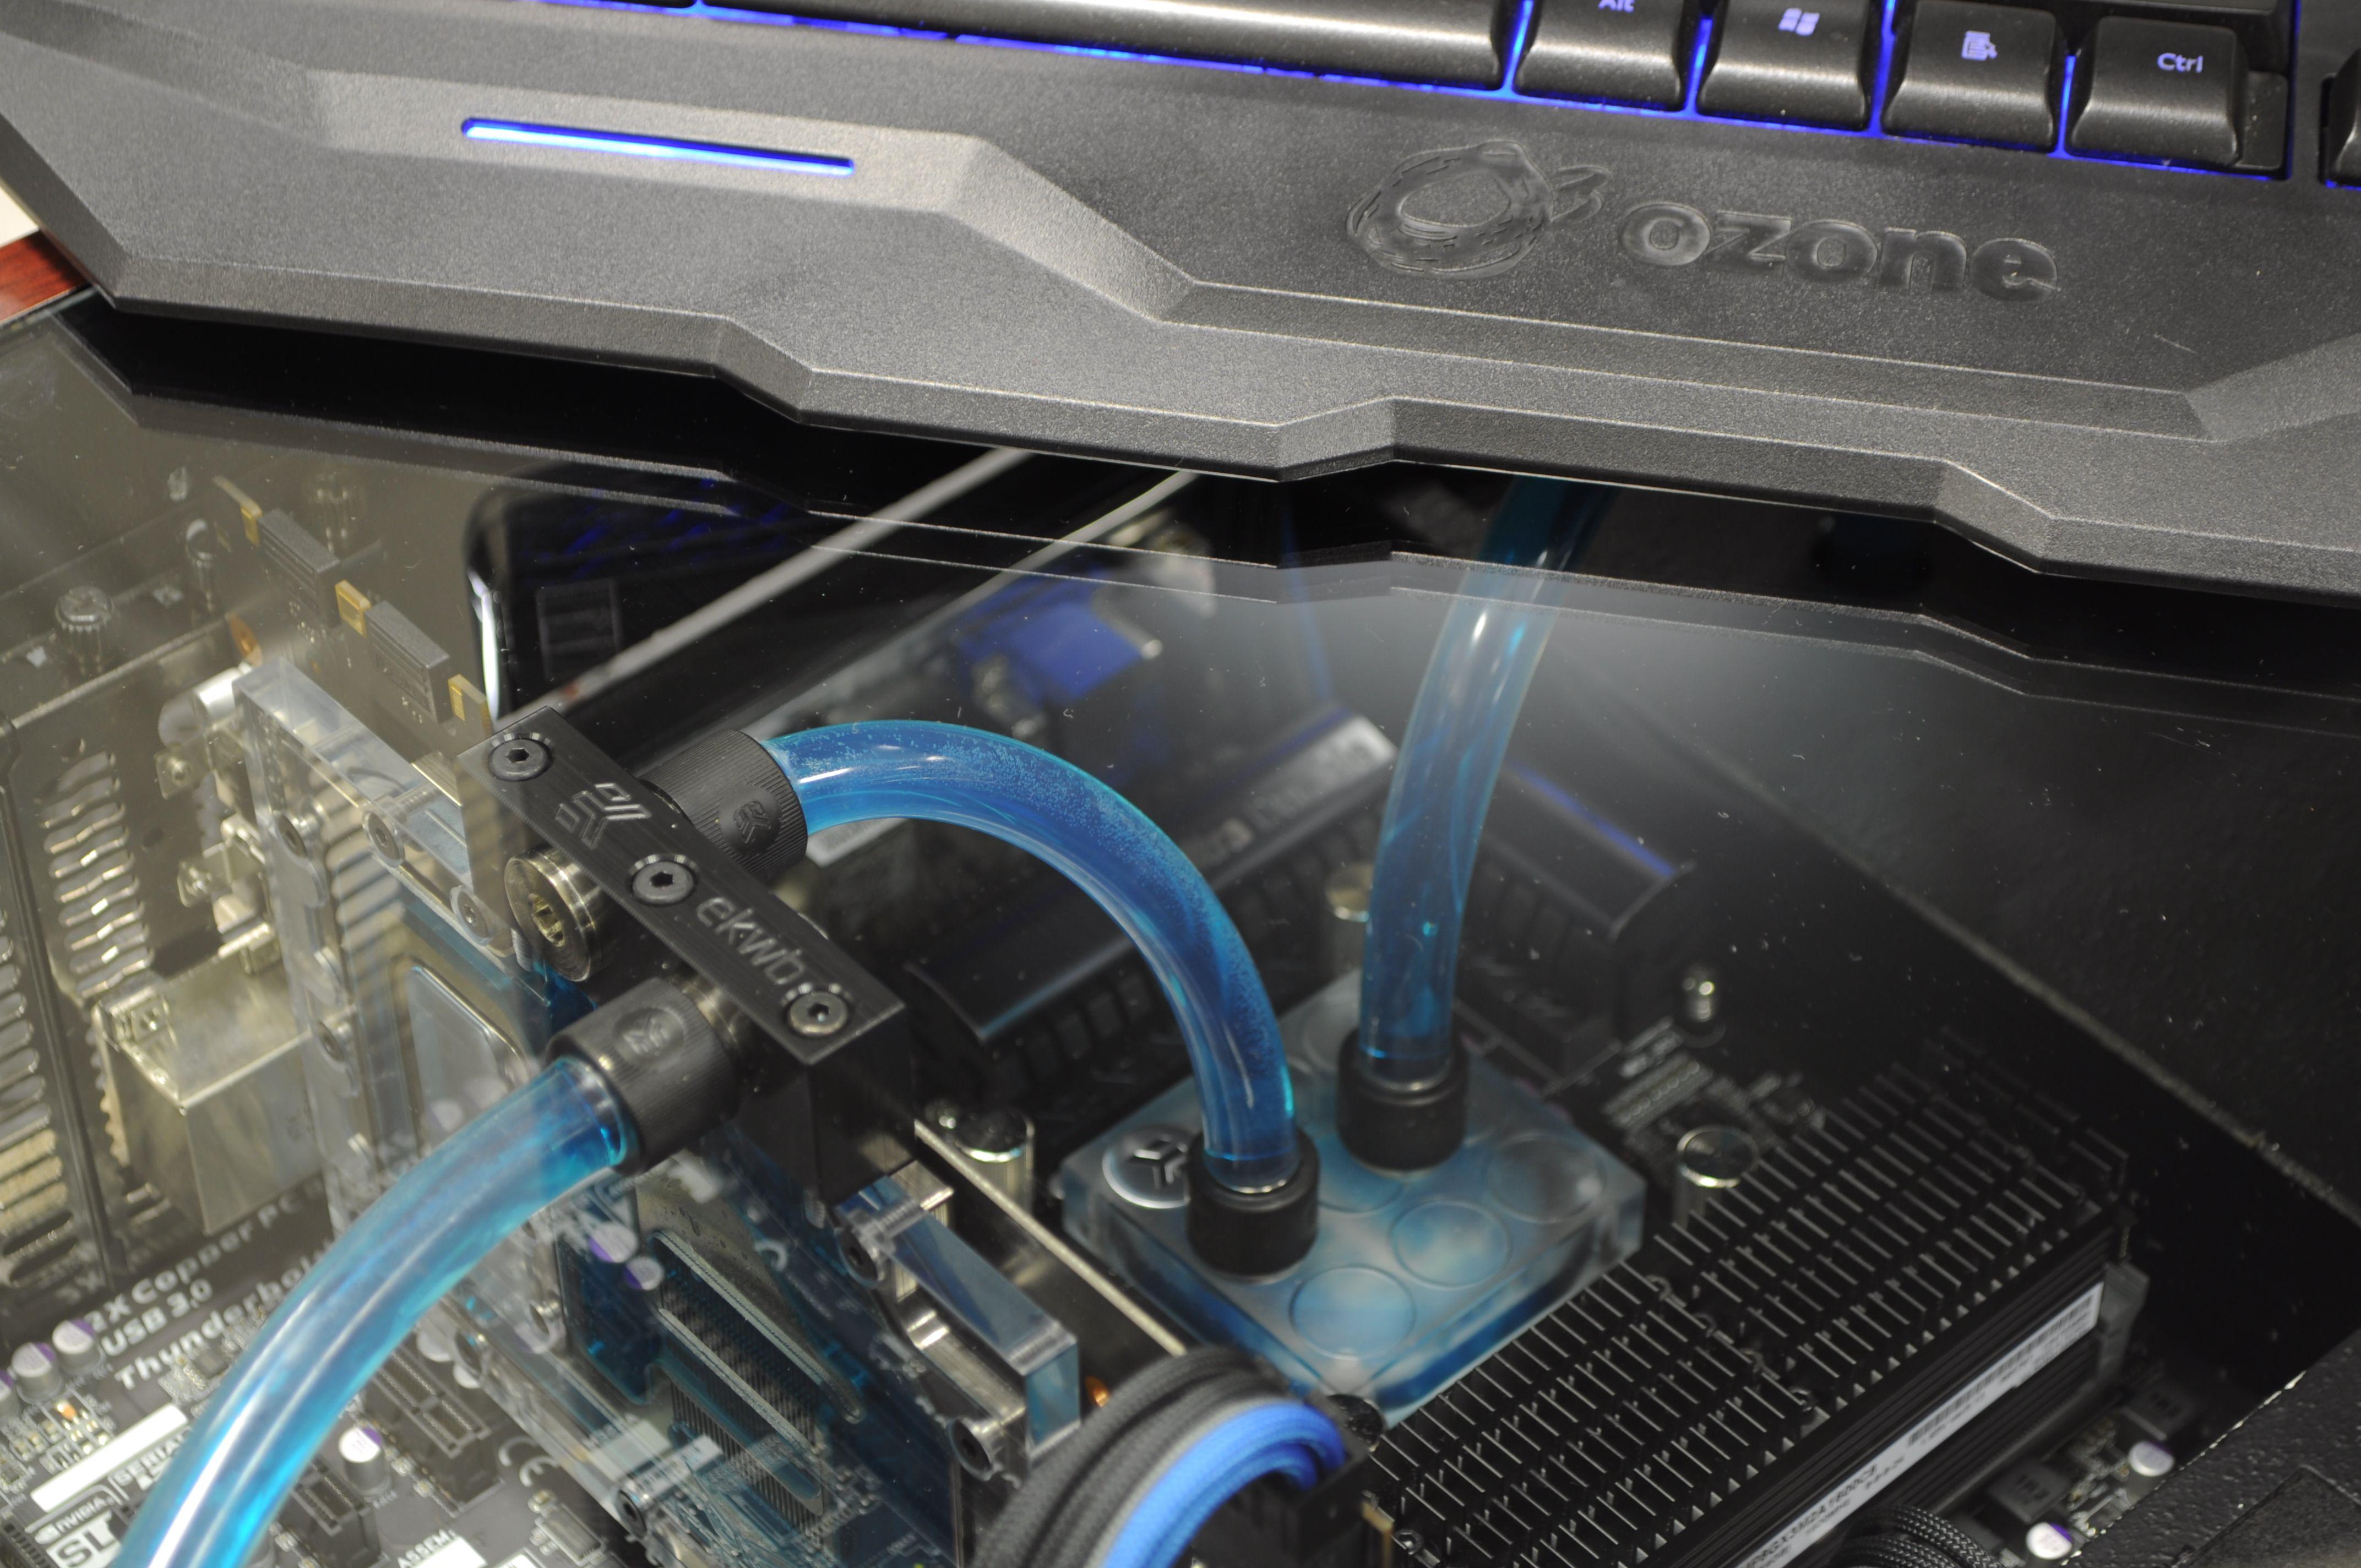 S7 desk update